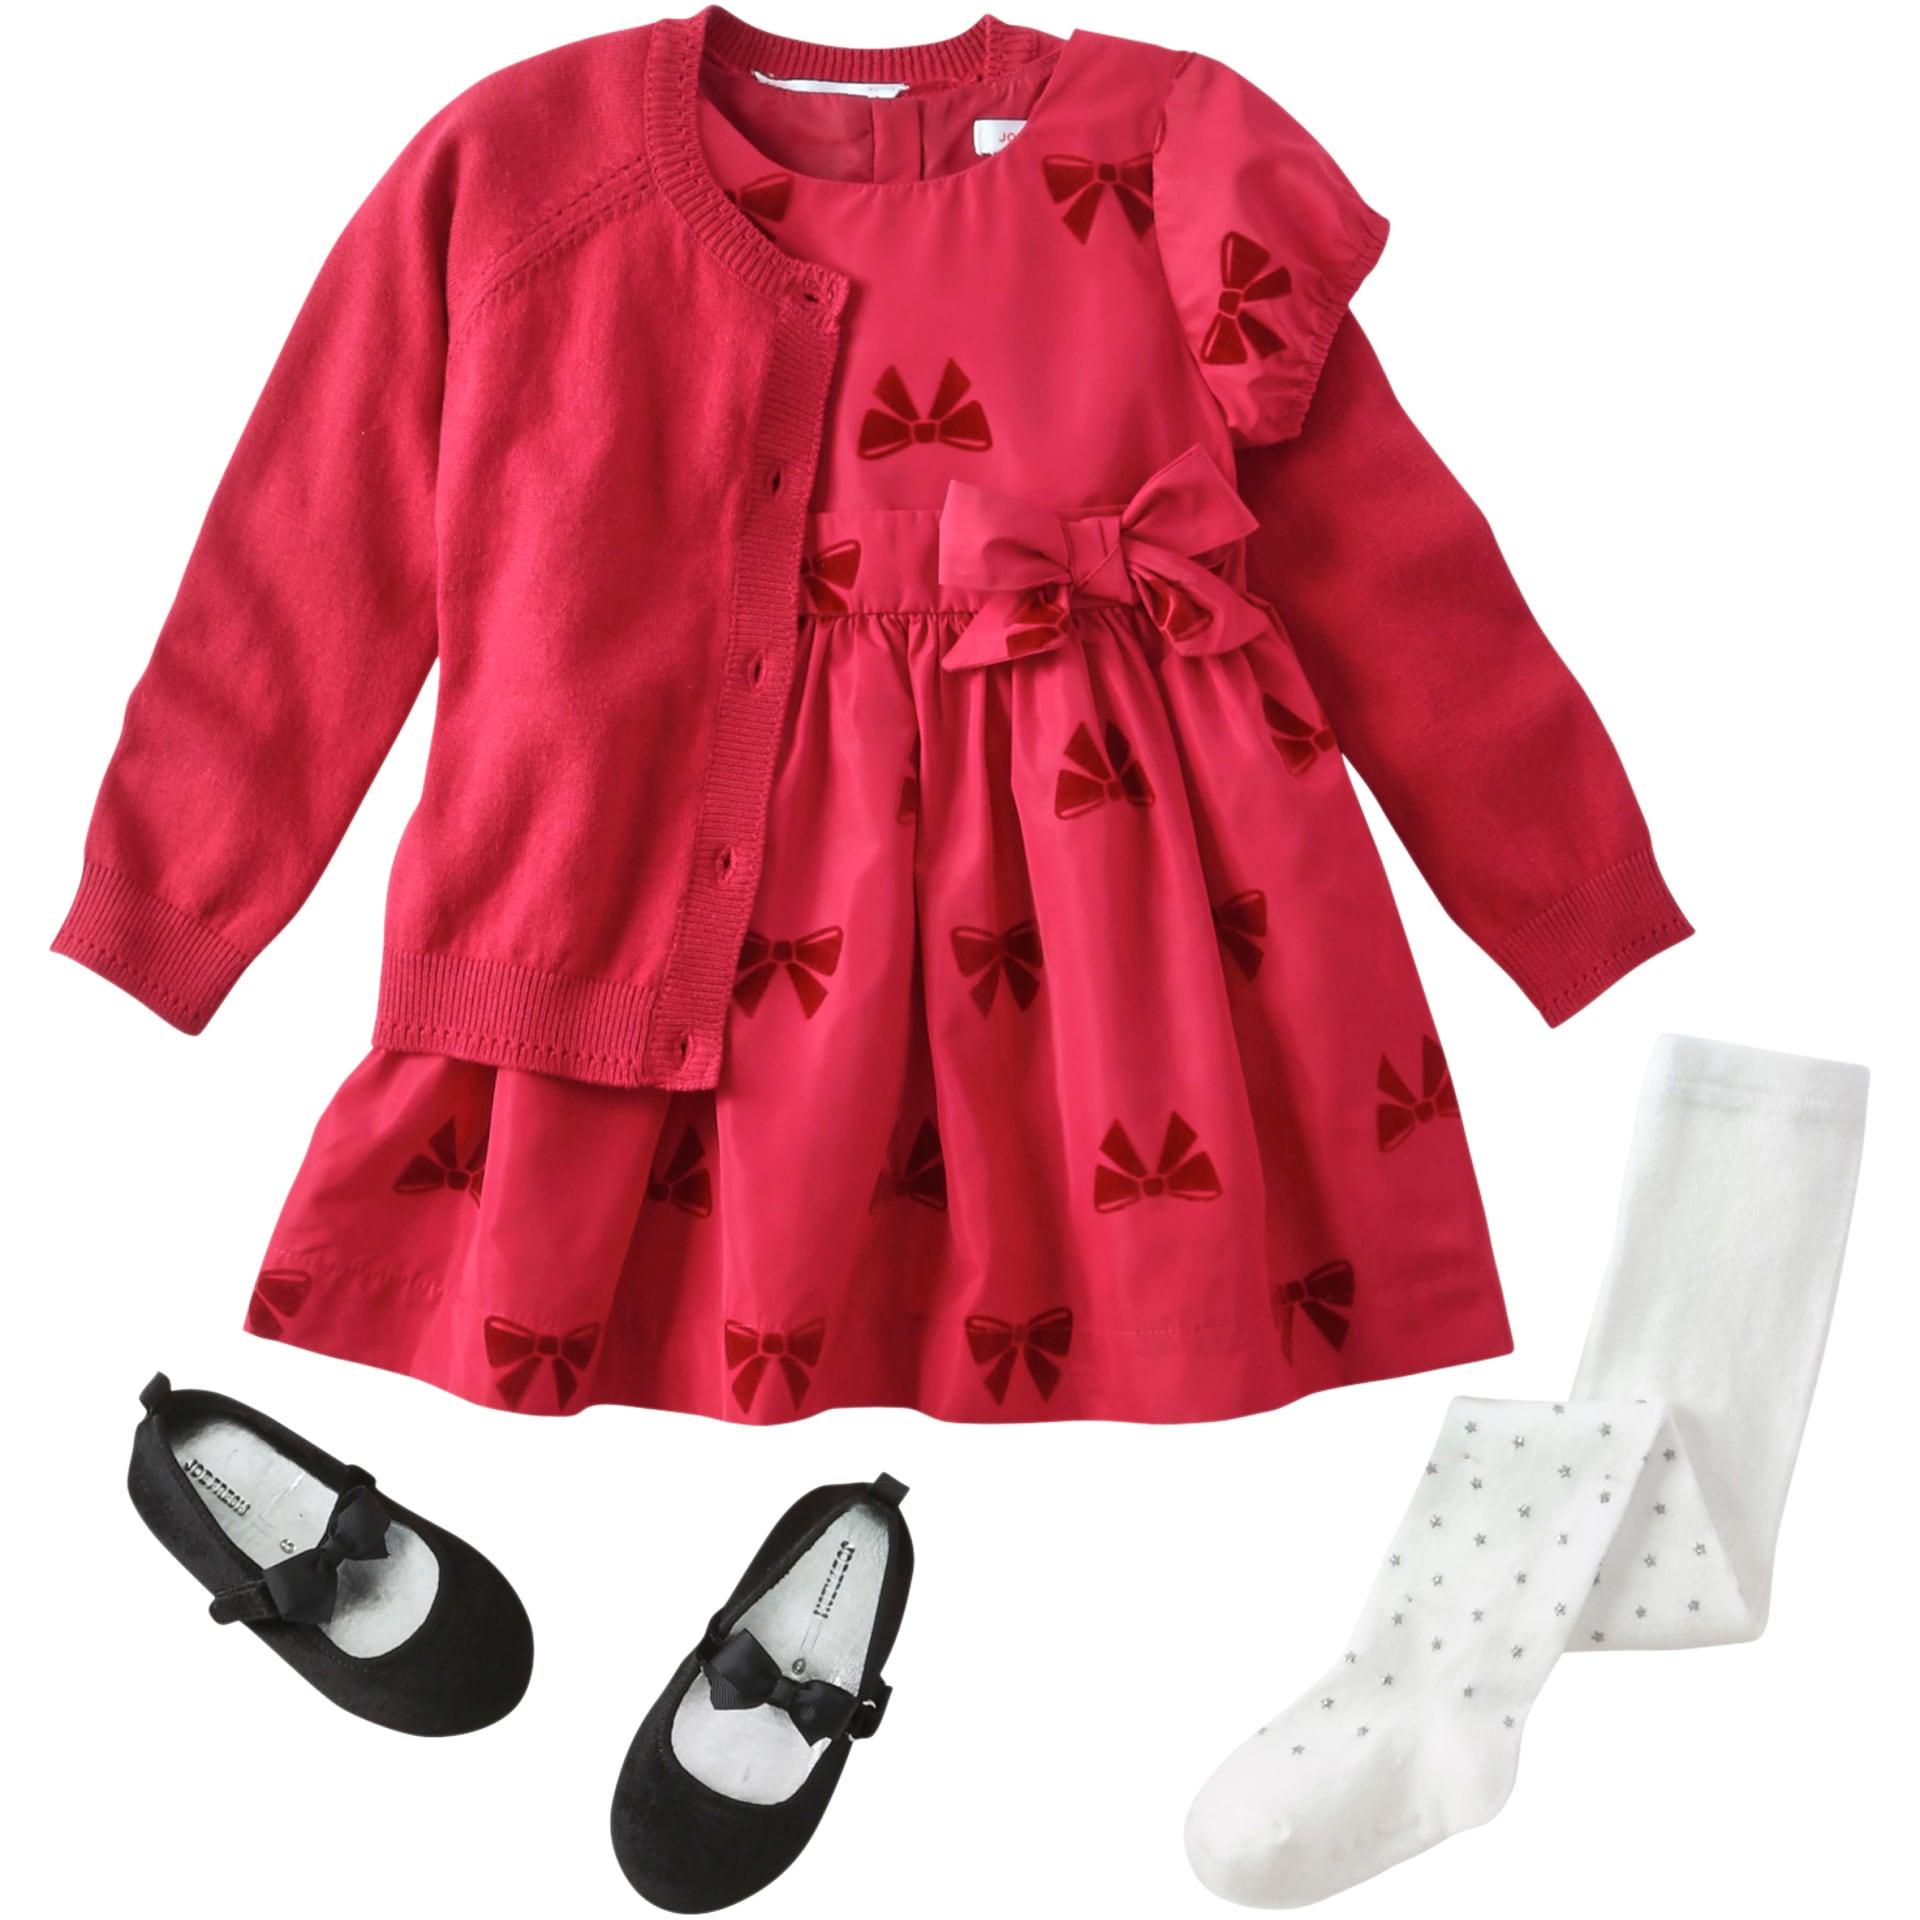 85ec21e88 Baby Girl Holiday Dressing Box in Carmine Red from Joe Fresh